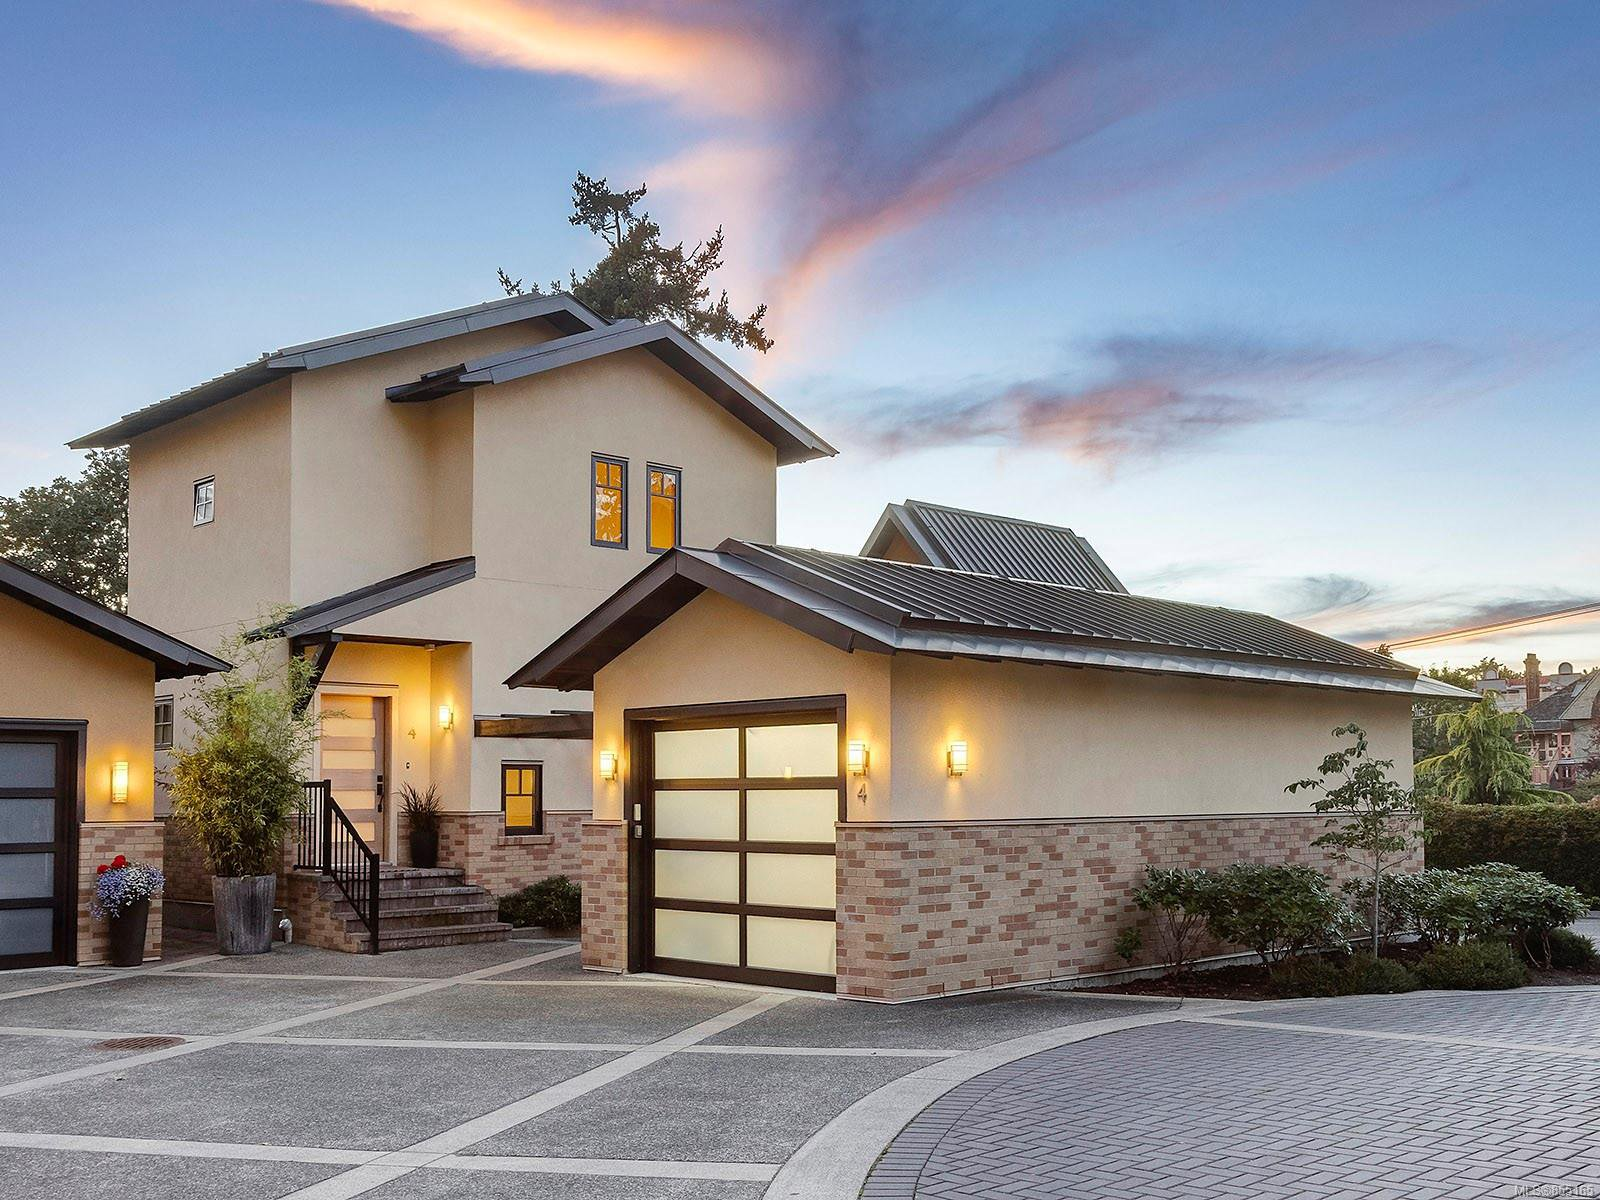 Main Photo: 4 849 Dunsmuir Rd in : Es Old Esquimalt House for sale (Esquimalt)  : MLS®# 855165